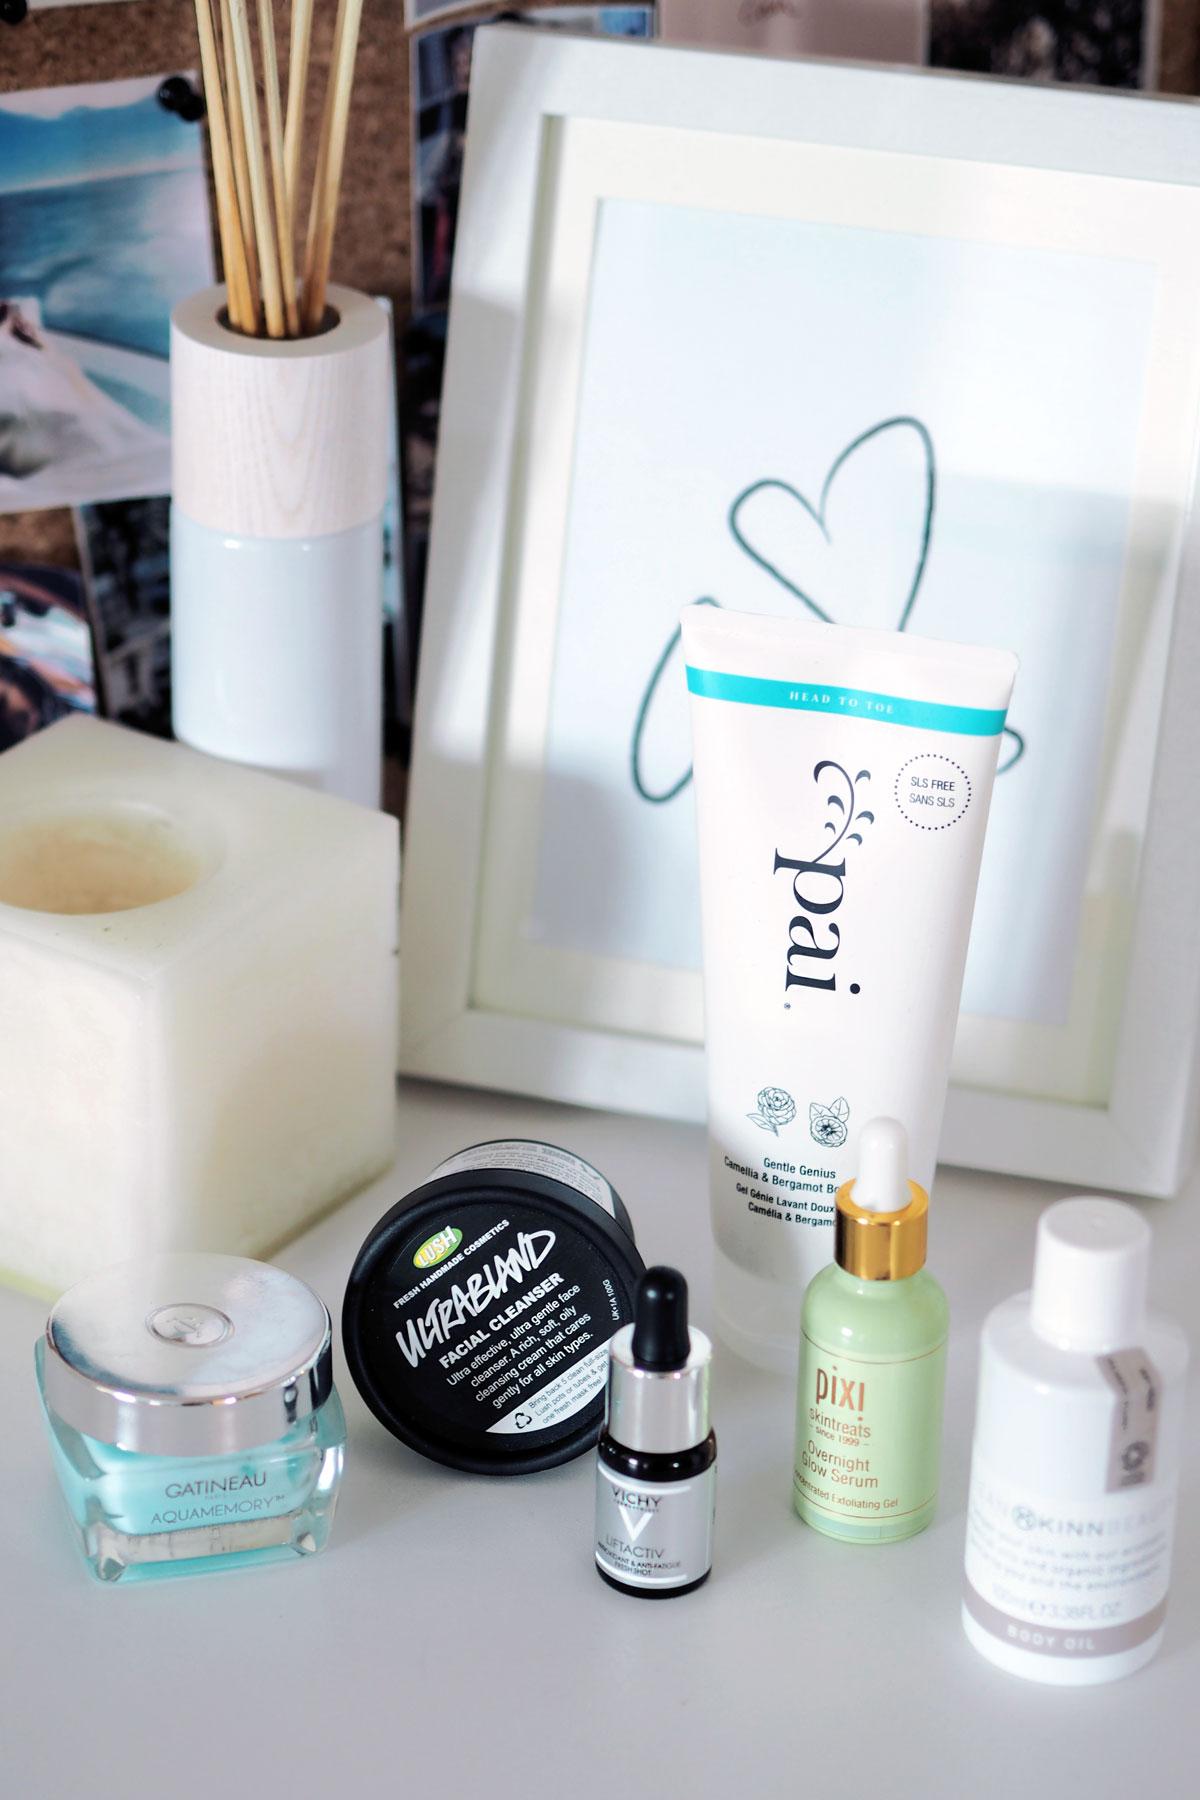 beauty products vichy lift activ serum pai gentle body wash pixi overnight glow serum lush ultrabland cleanser